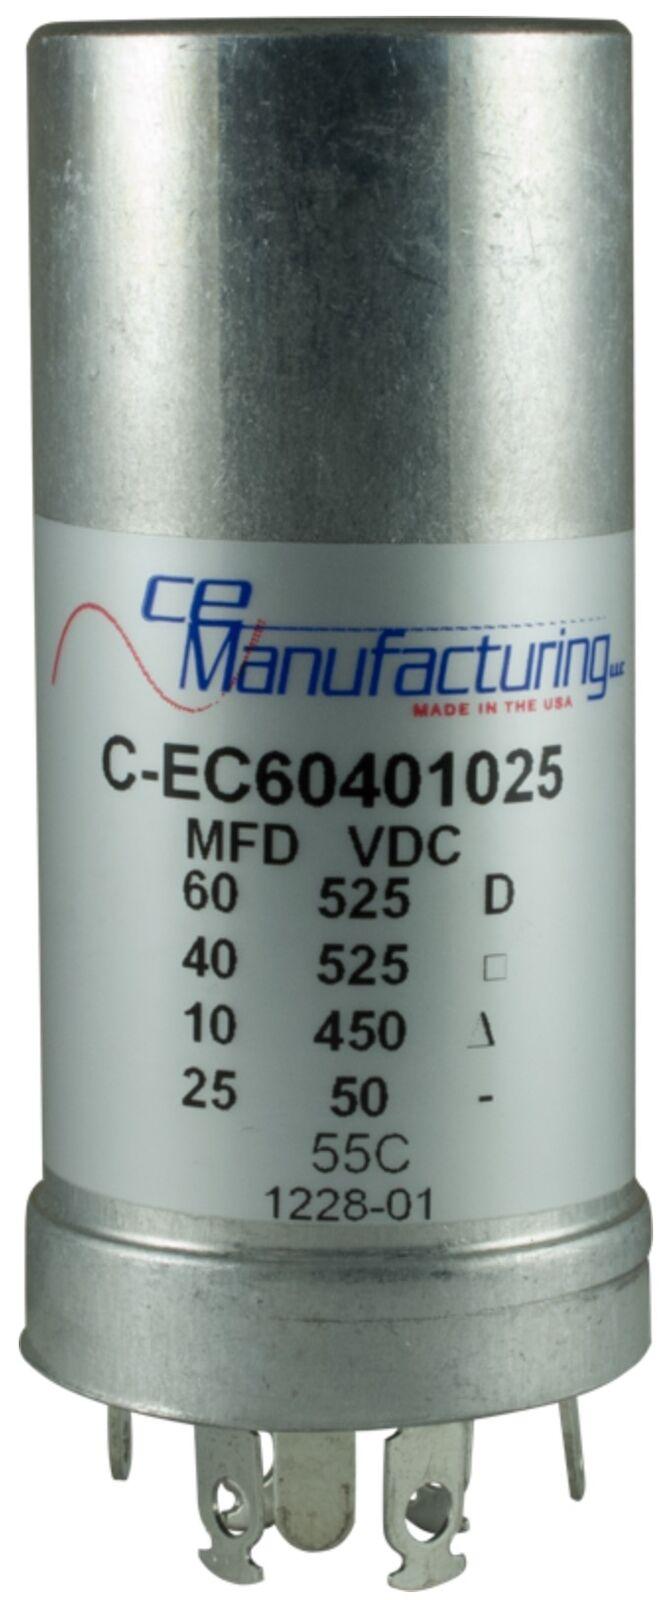 CE fabricación multisection Mallory fp puede condensador, condensador, condensador, 60 40μf @ 525VDC 10μf..  diseño único